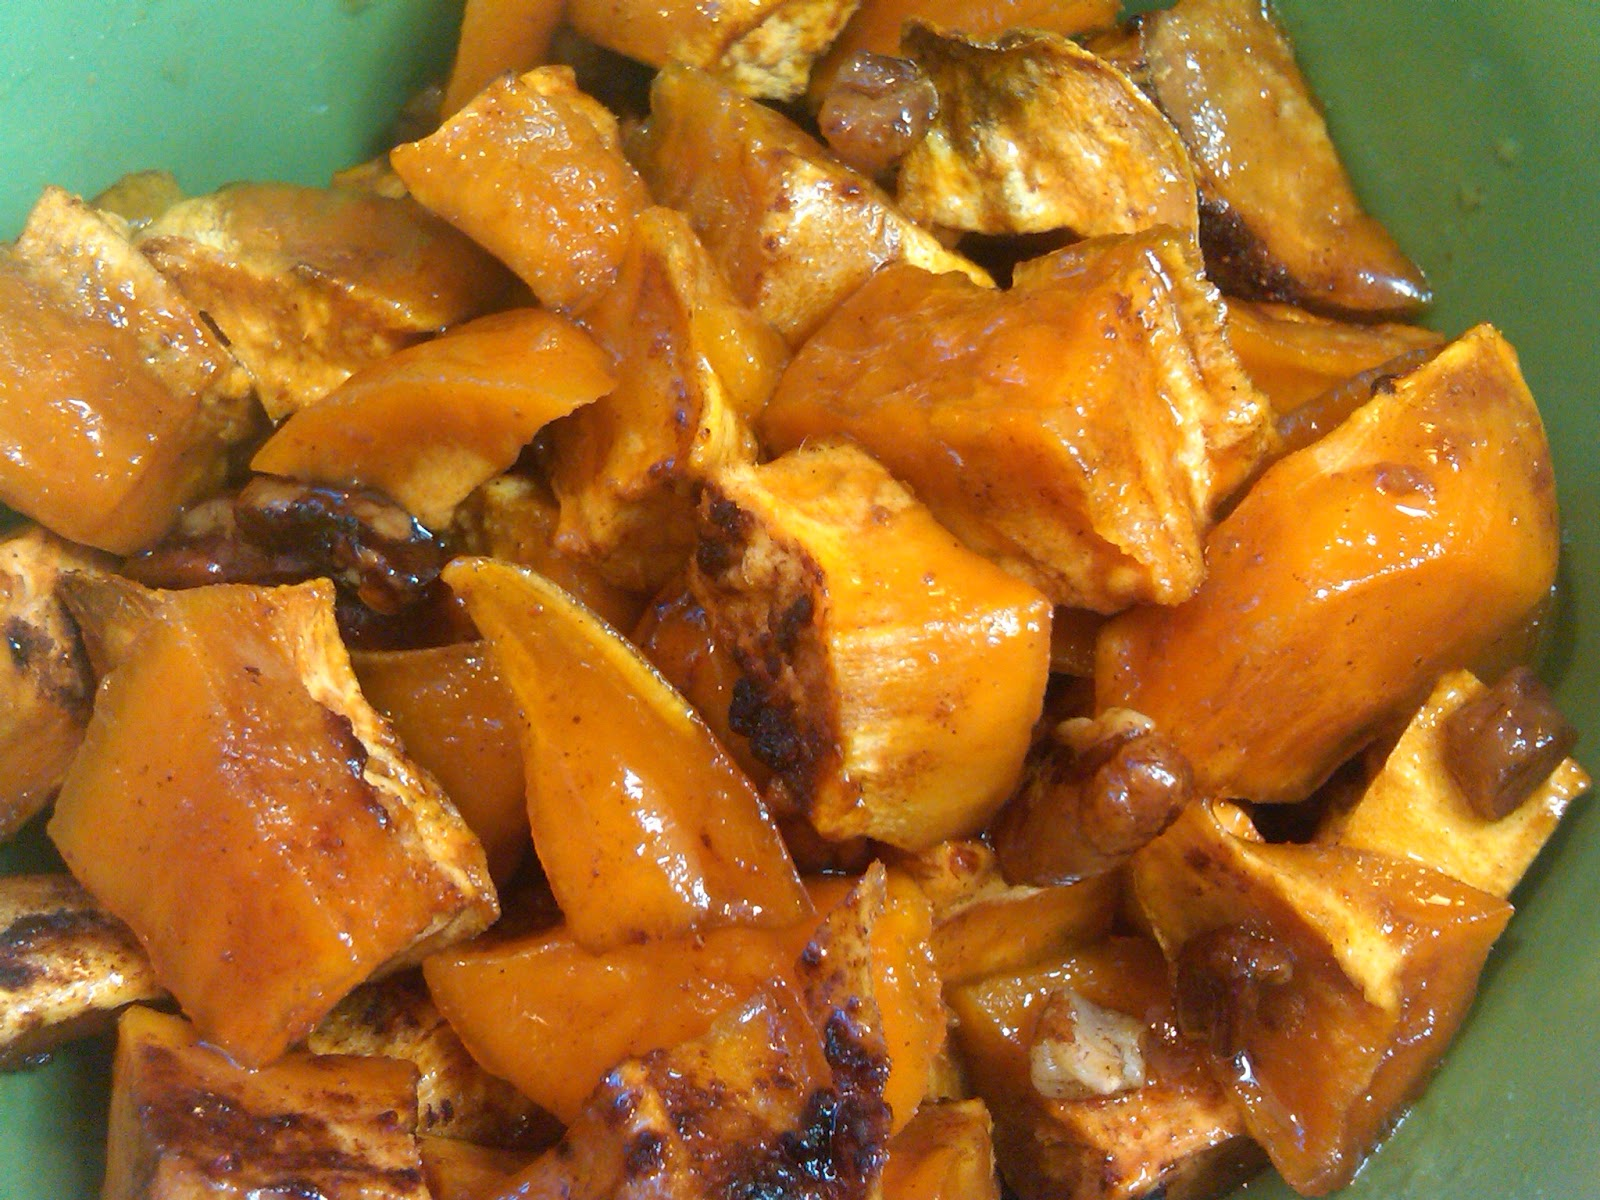 roasted sweet potatoes 2 sweet potatoes peeled and cubed 1